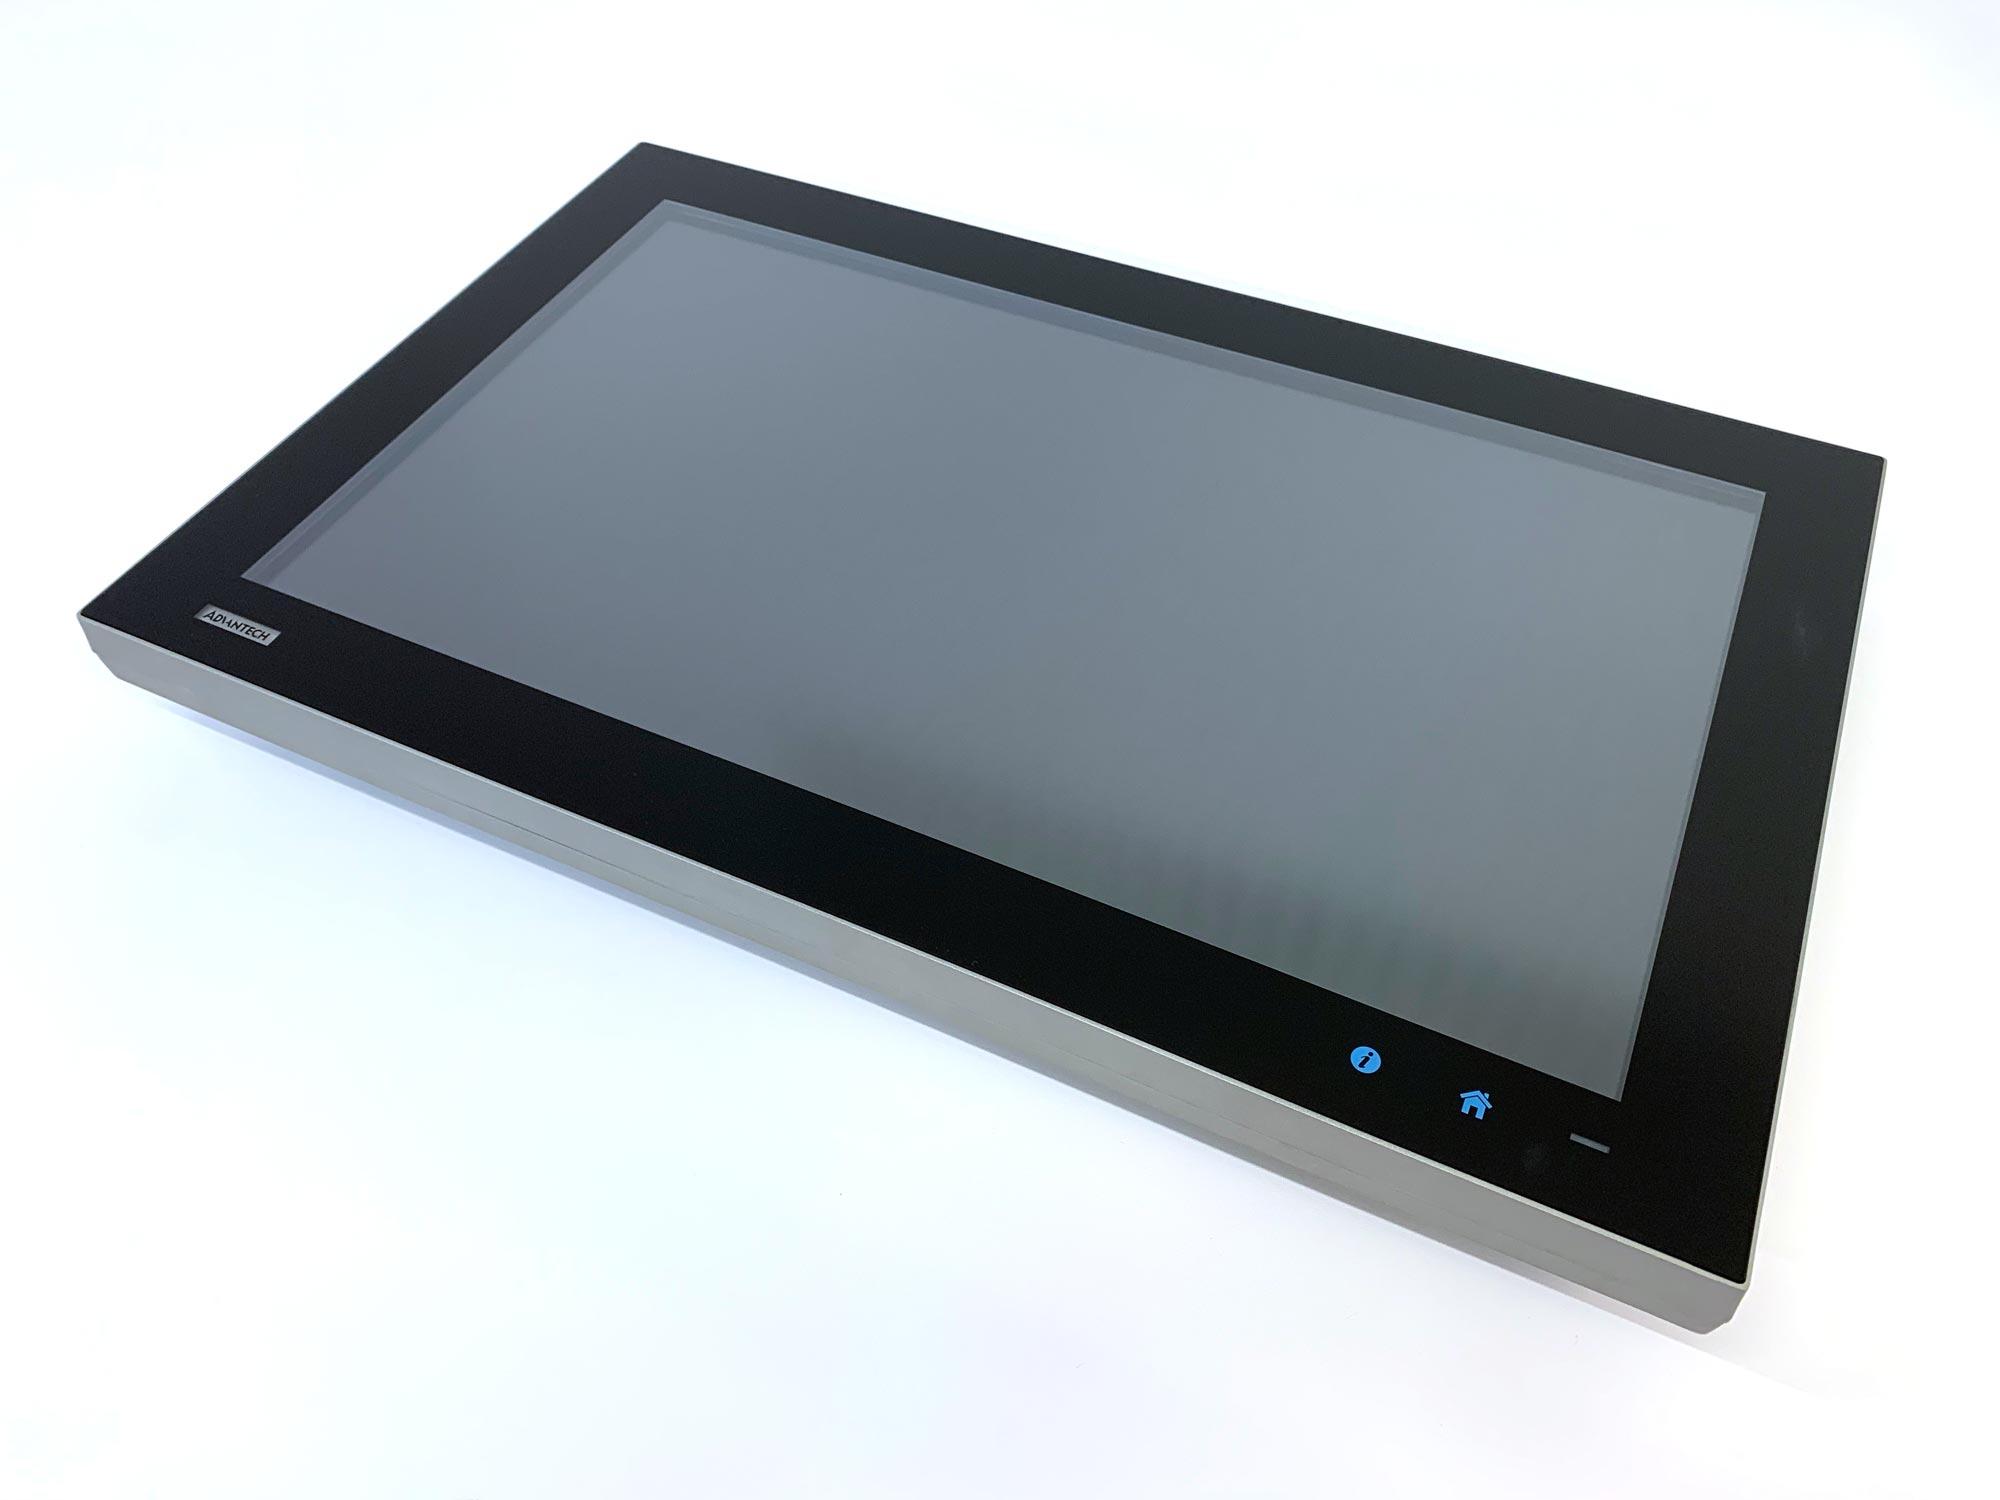 SPC-2140WP - geschlossener Touch-Panel PC mit 21,5-Zoll Display